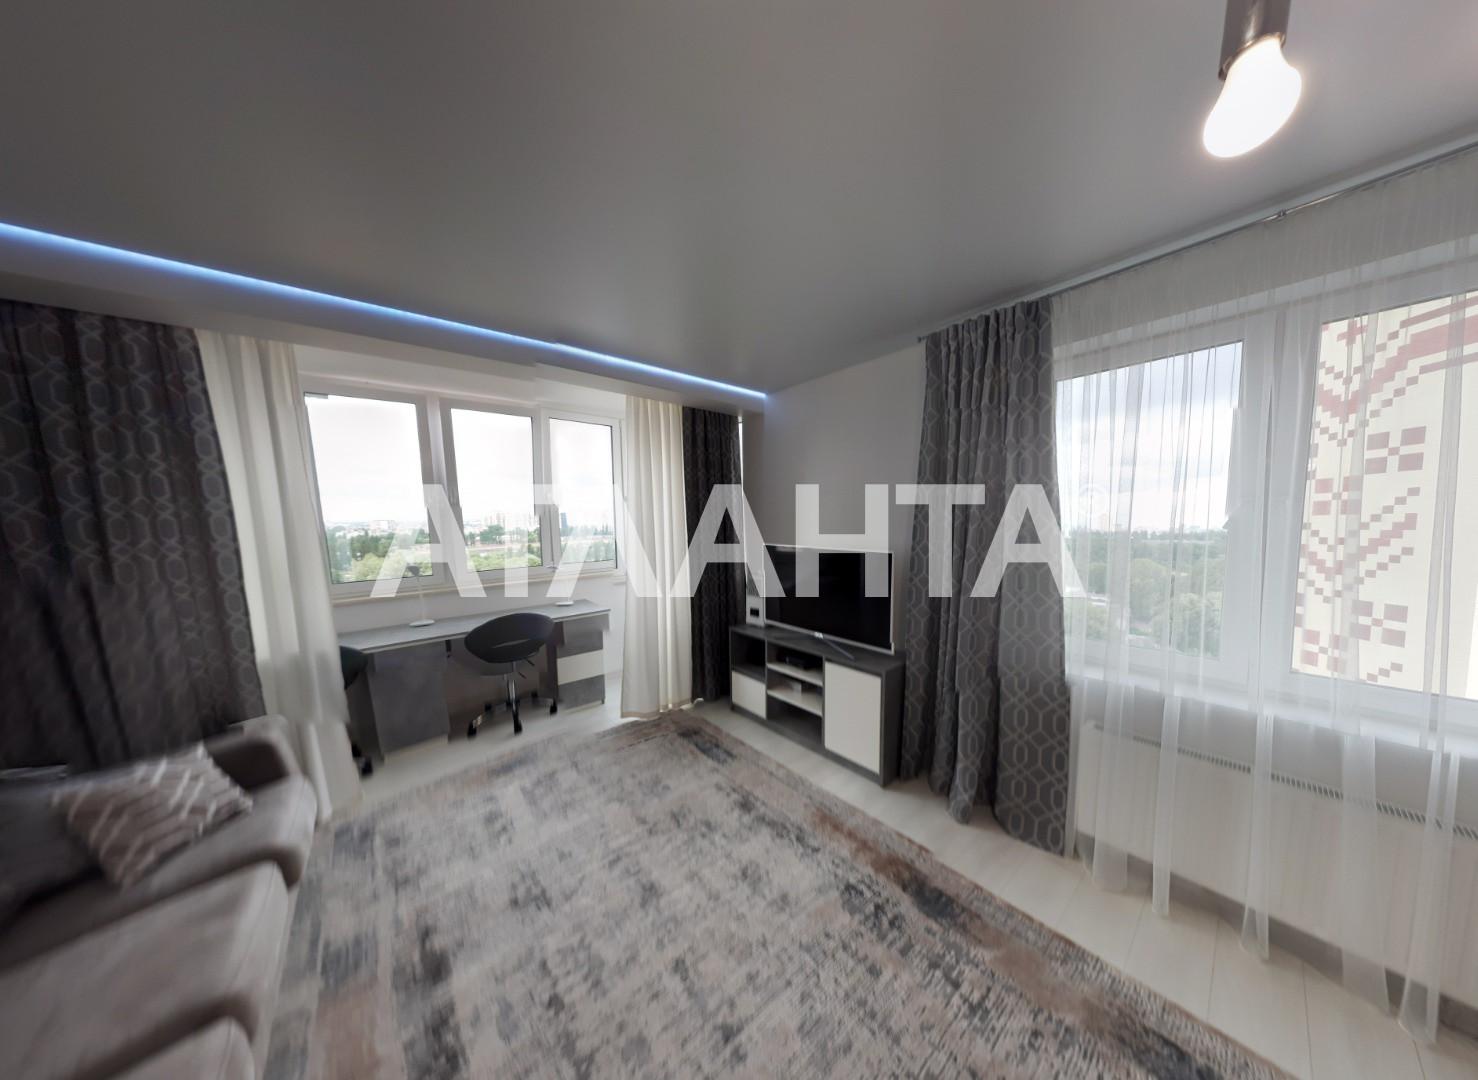 Продается 3-комнатная Квартира на ул. Просп. Глушкова — 160 000 у.е. (фото №11)